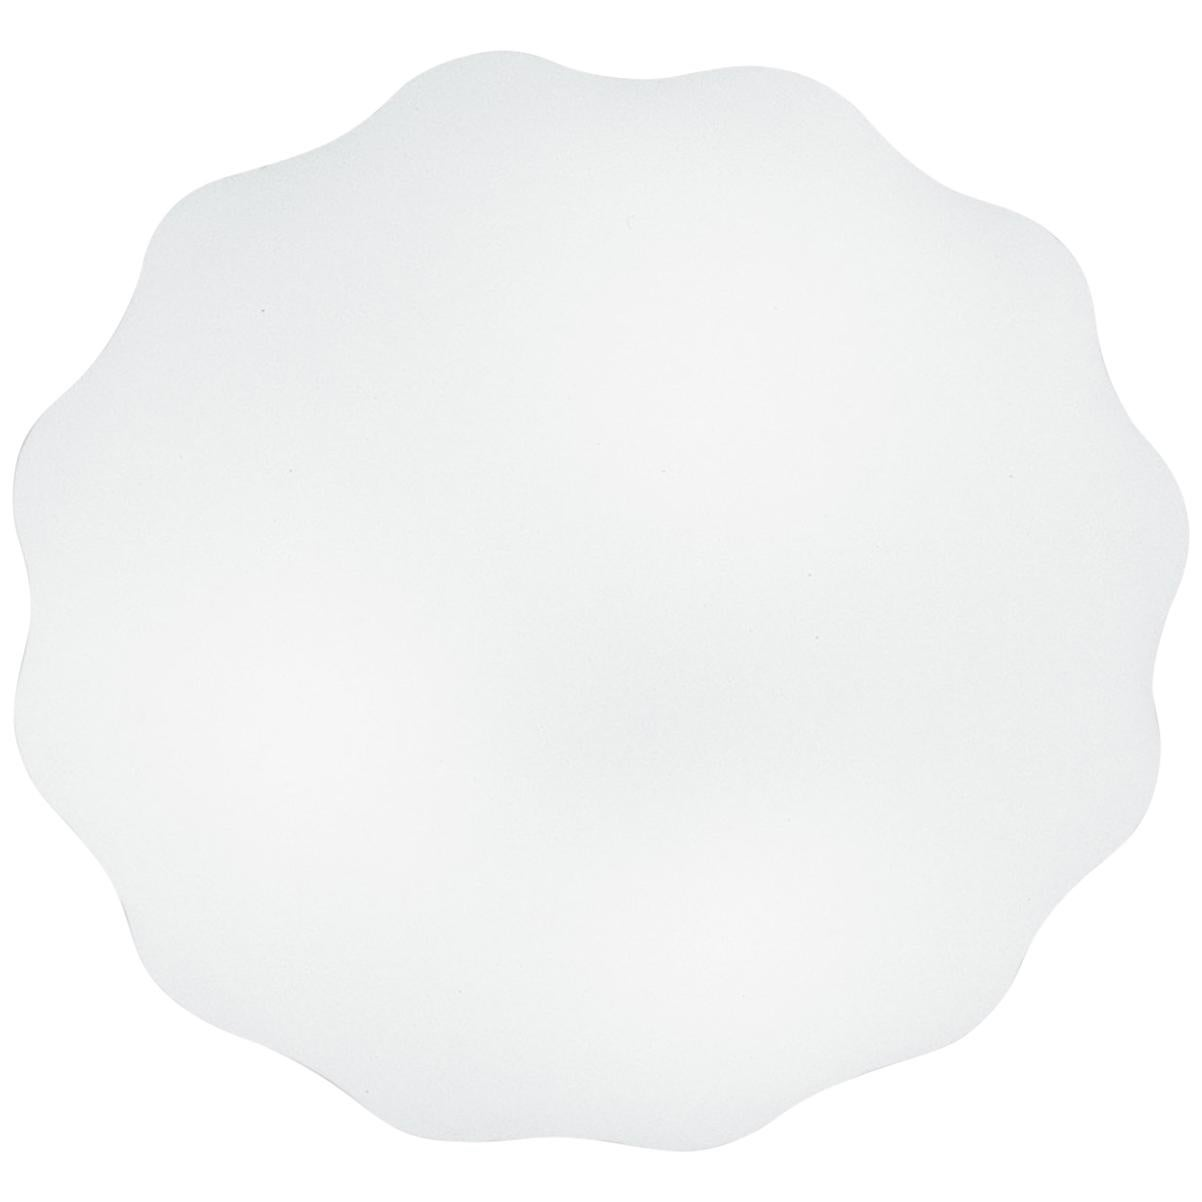 Leucos Nubia P-PL 60 LED Sconce in Satin White by Toso, Massari & Associates